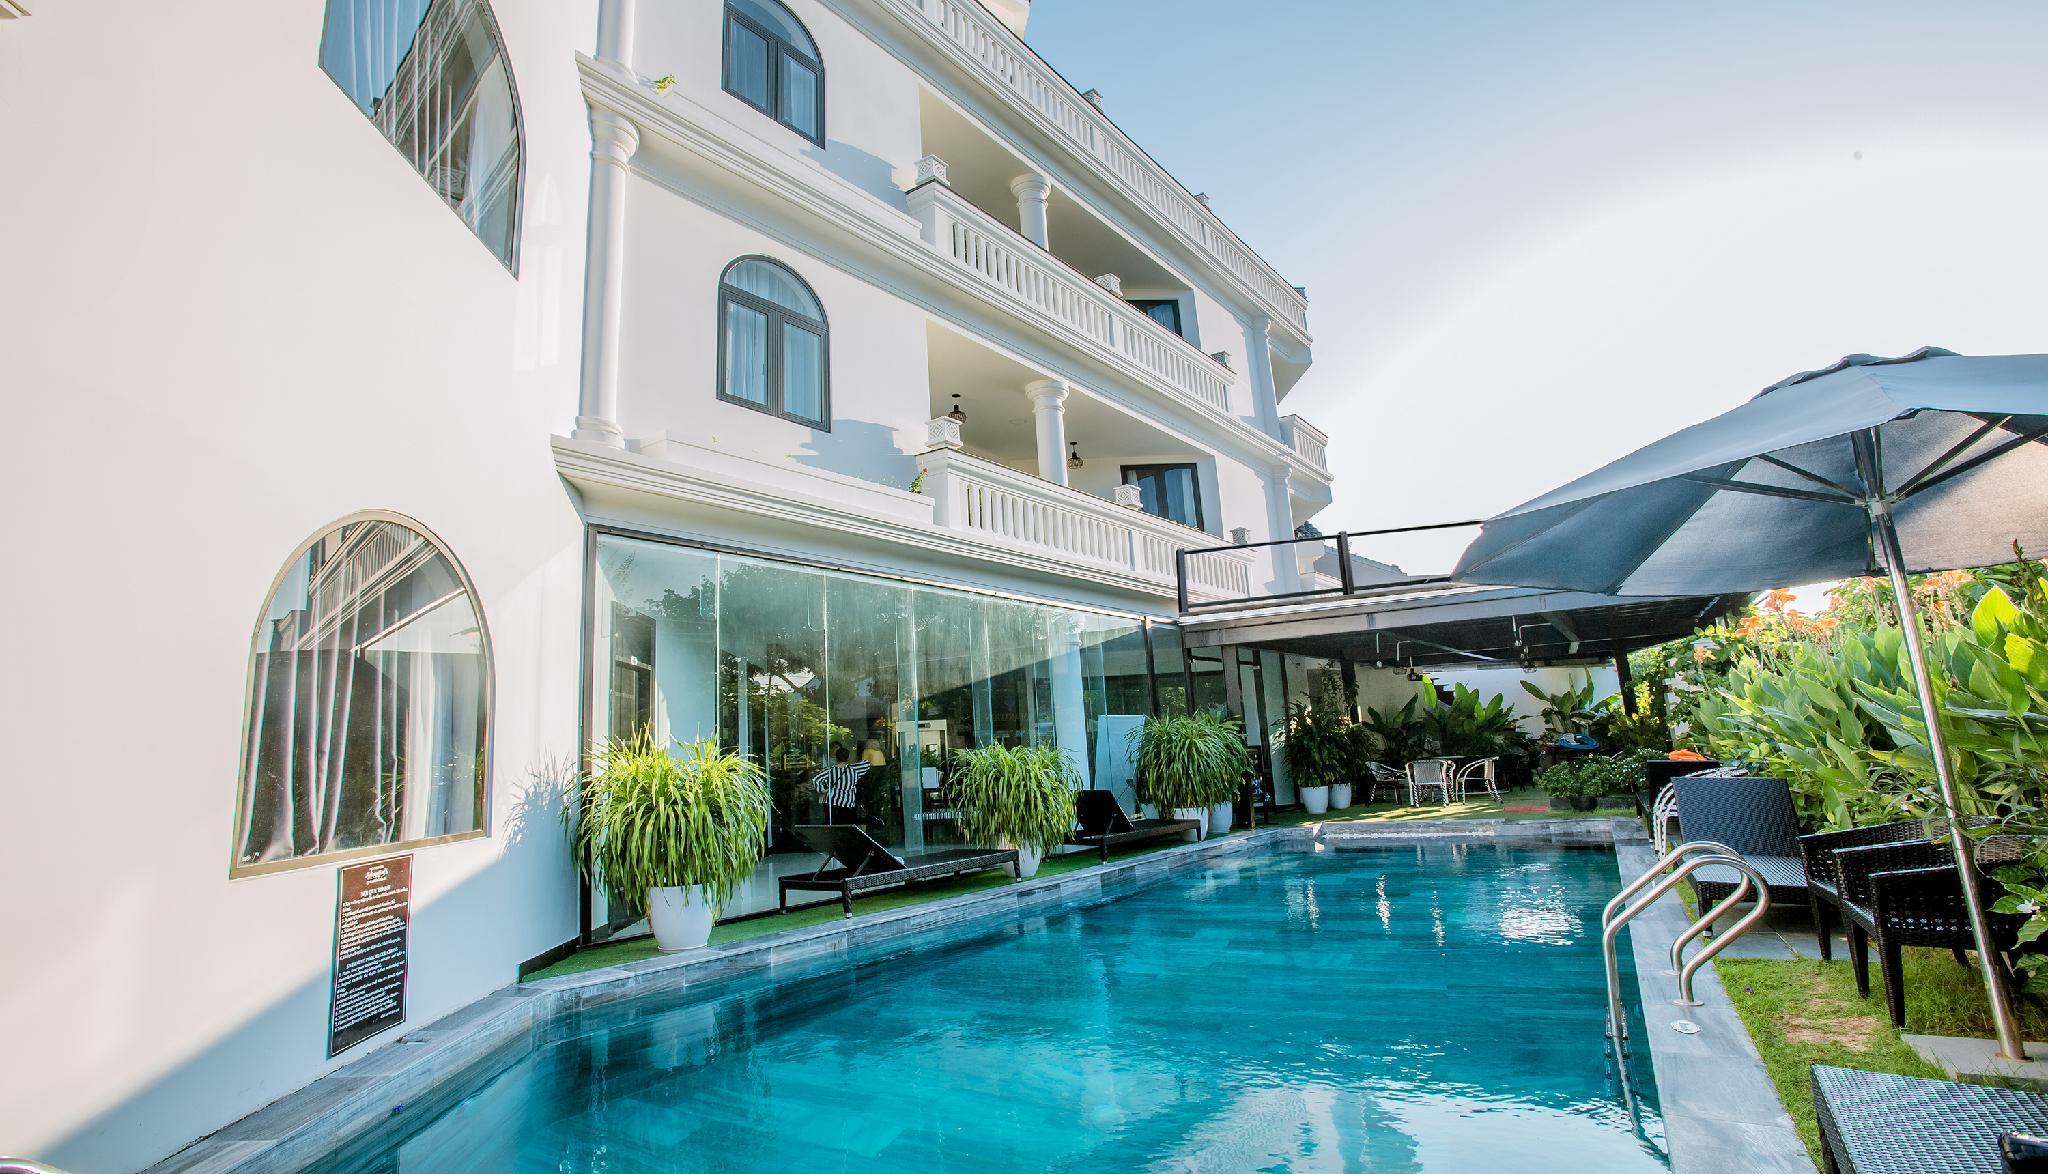 Hoianation Villas Hotel